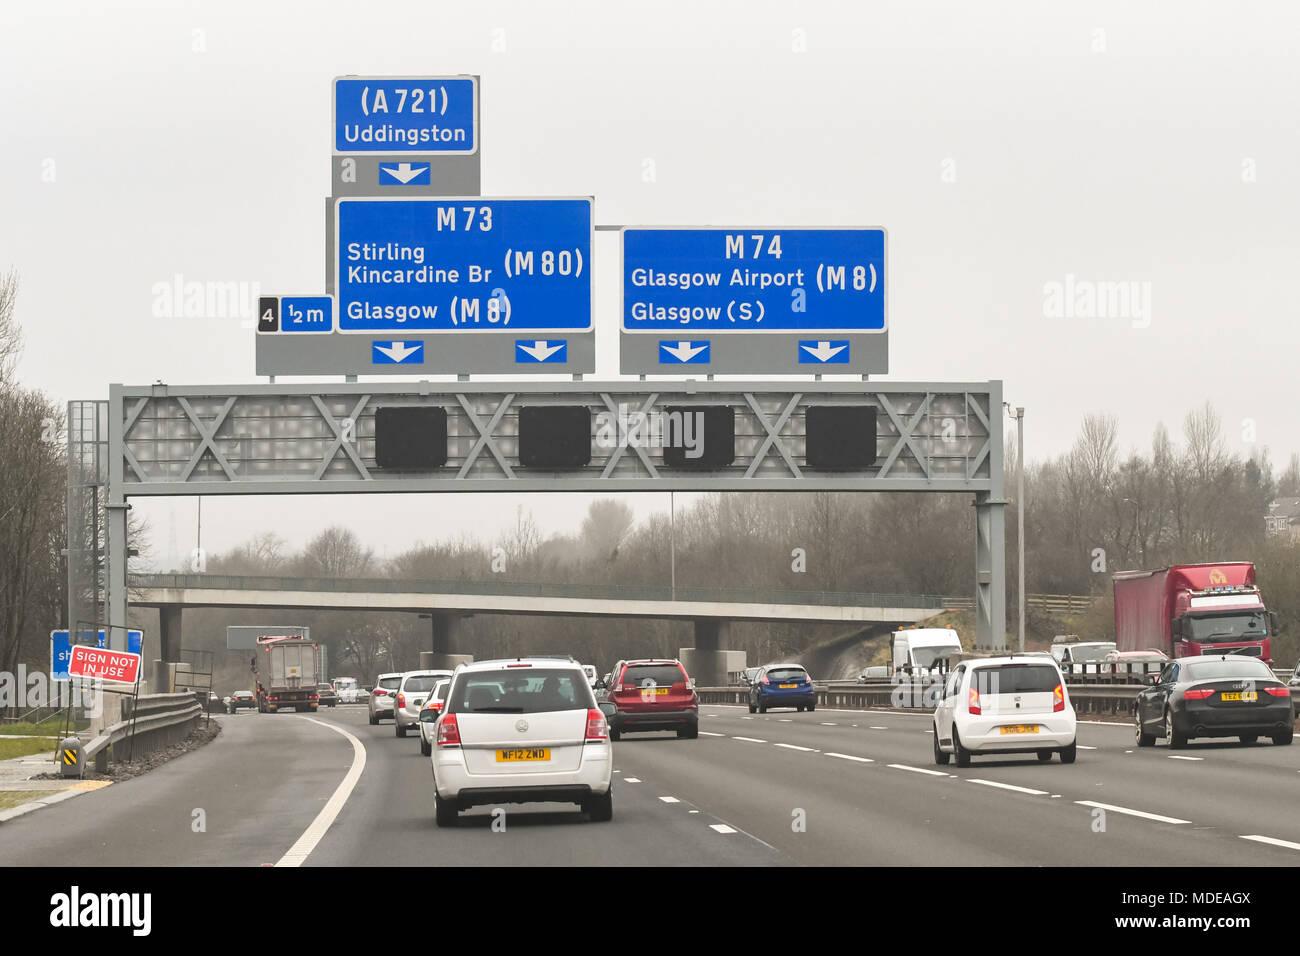 M74 motorway junction 4 for M73, Scotland, UK Stock Photo